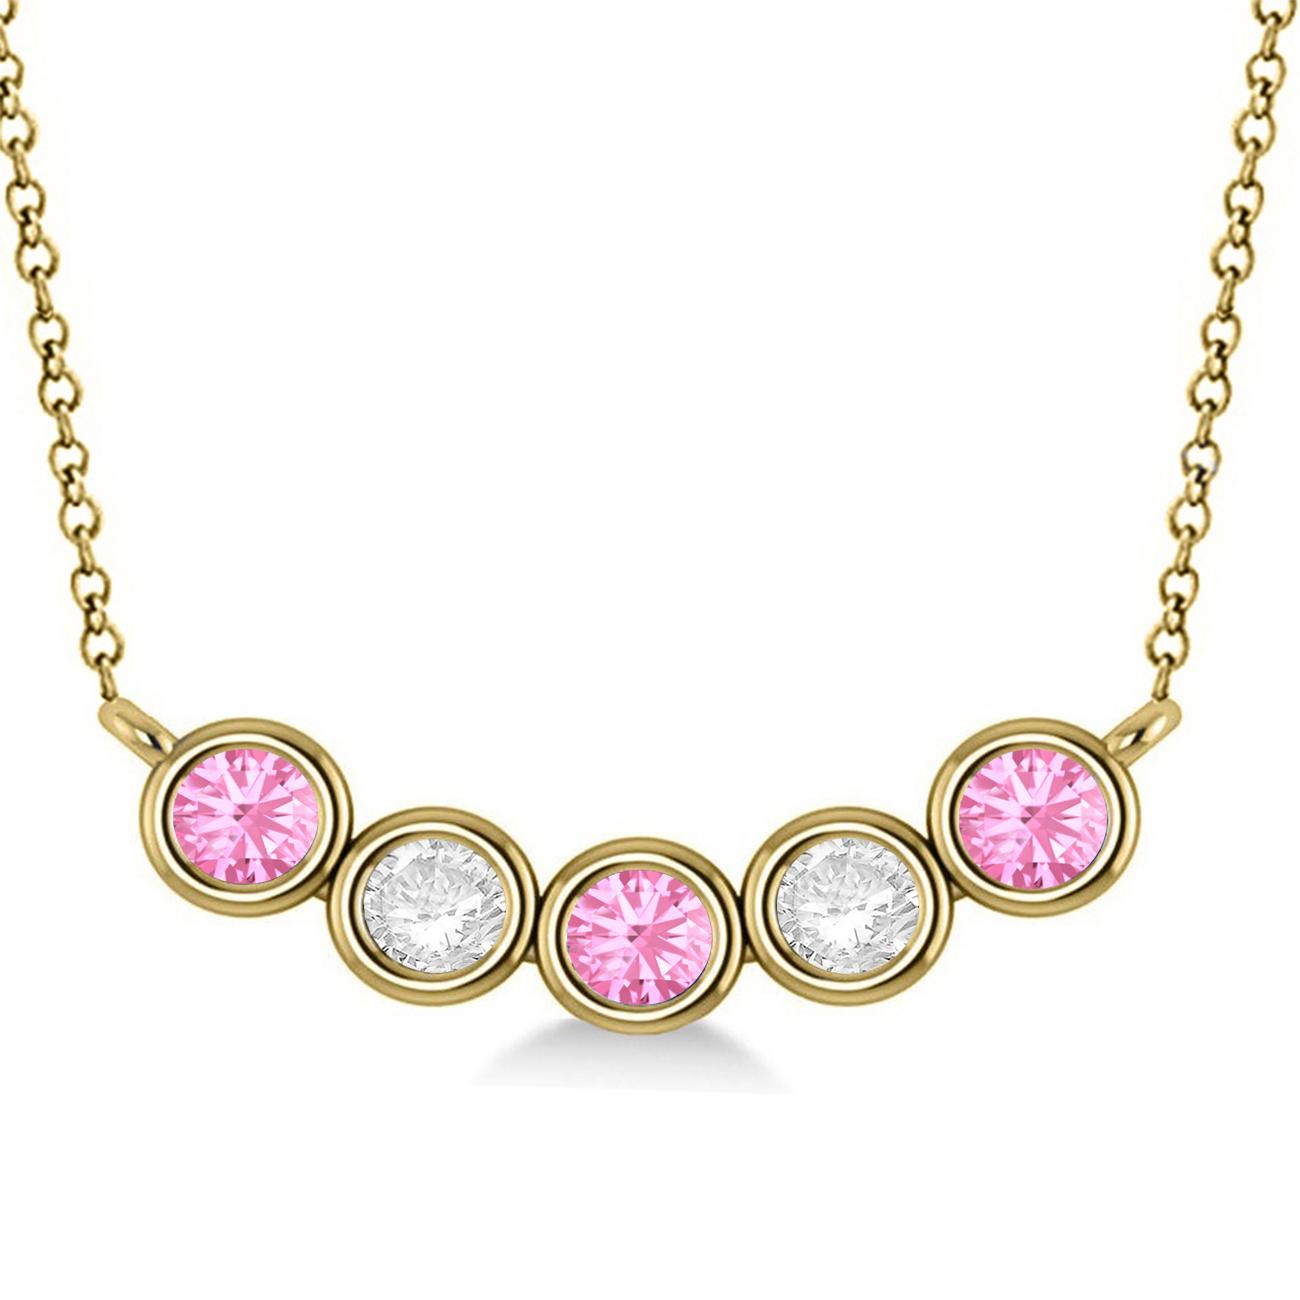 diamond pink tourmaline 5 stone pendant necklace 14k. Black Bedroom Furniture Sets. Home Design Ideas